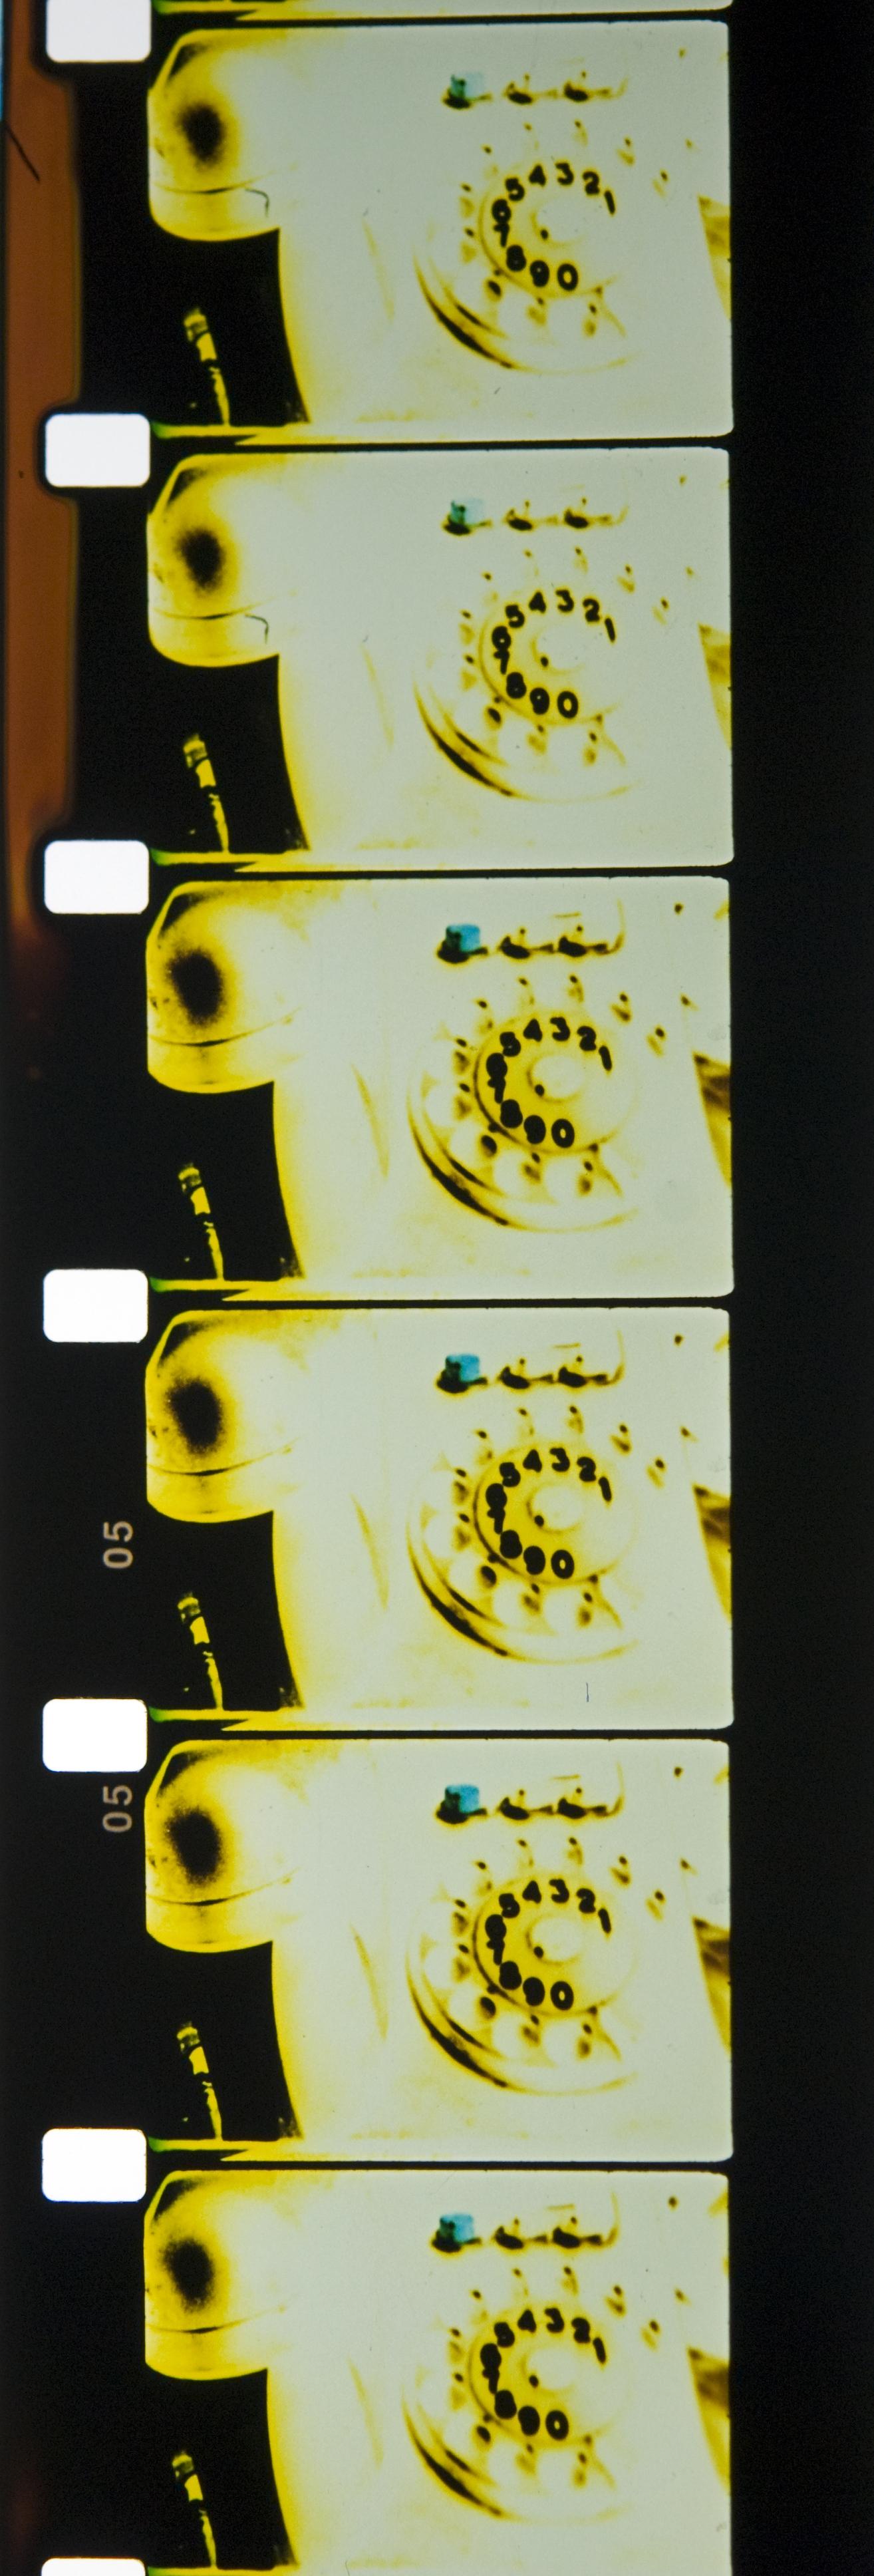 v=d/t film strip